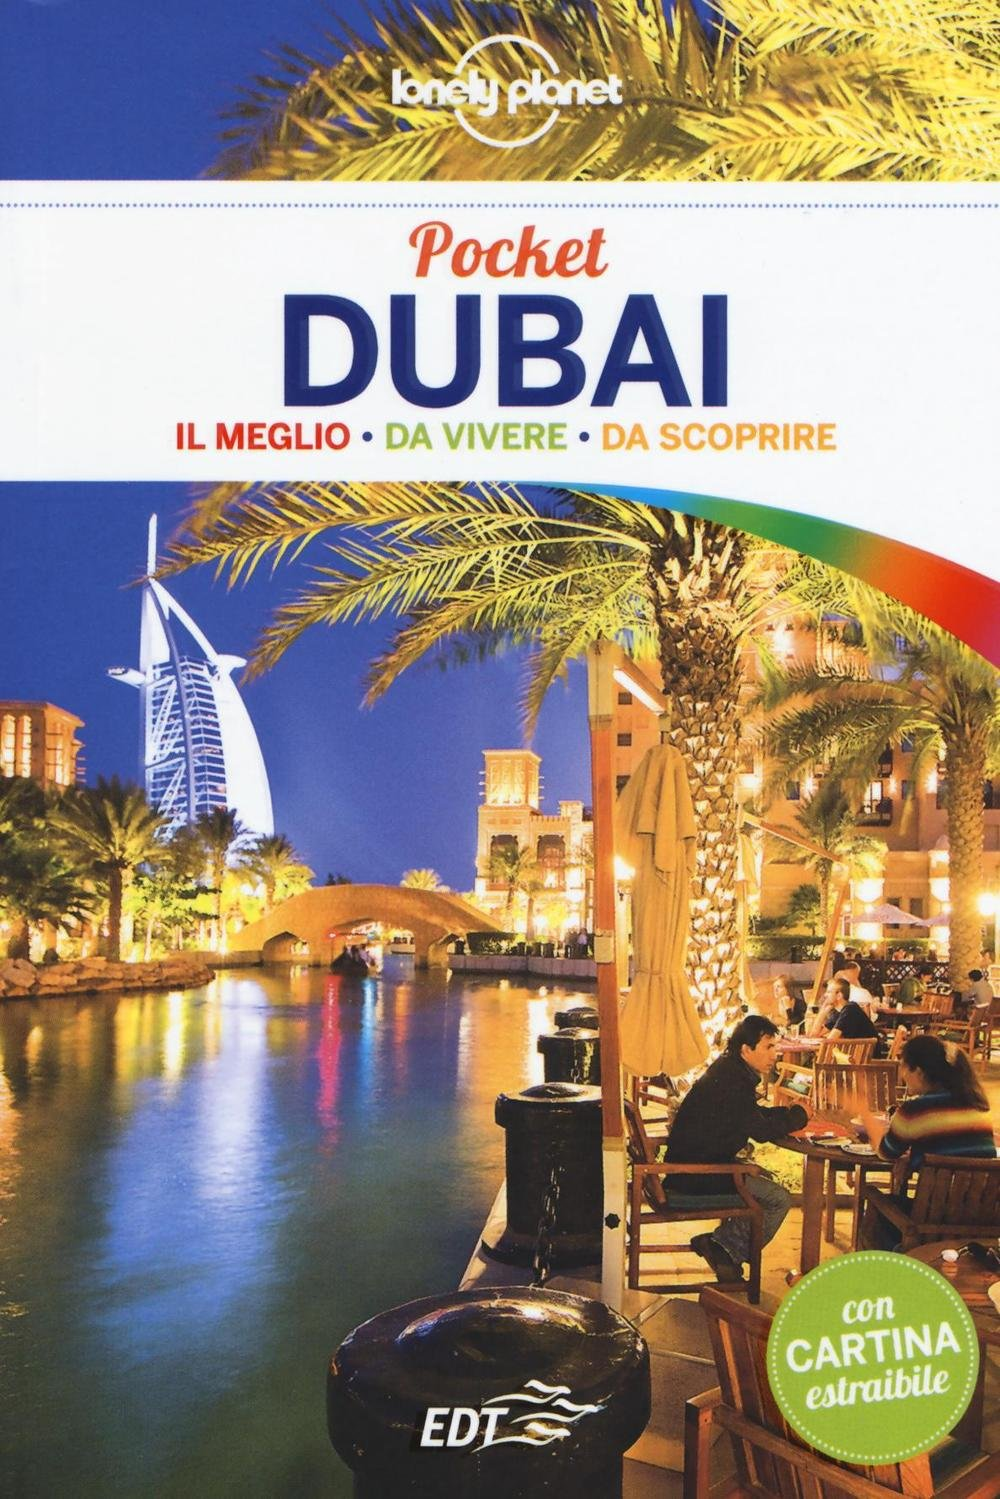 Cartina Turistica Dubai.Amazon It Dubai Con Cartina Schulte Peevers Andrea Dapino Cesare Vargiu Riccardo James Libri